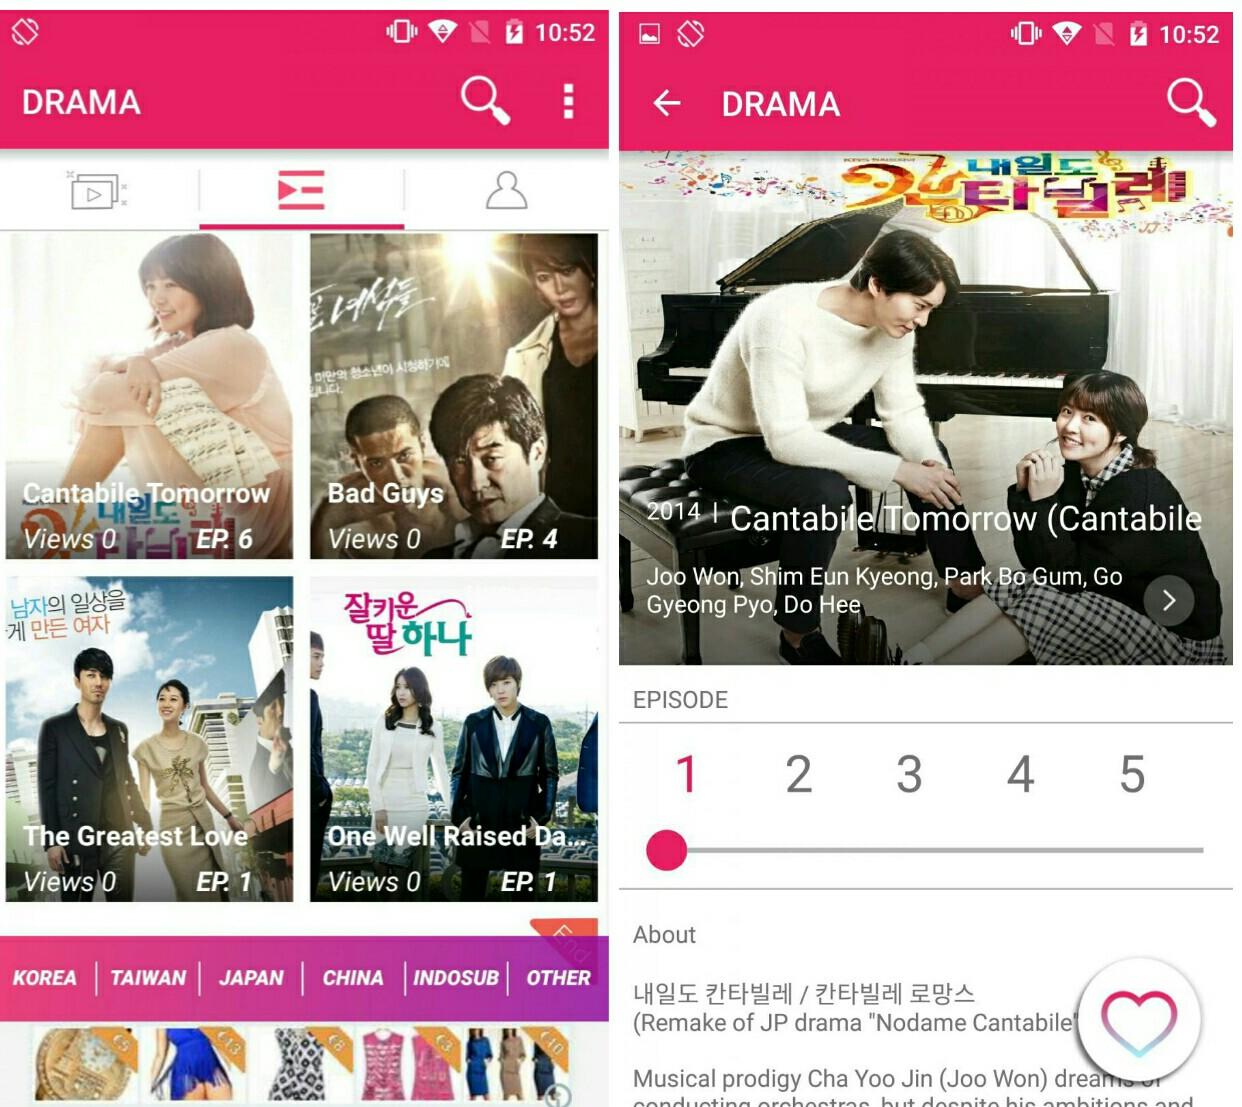 kdrama-app